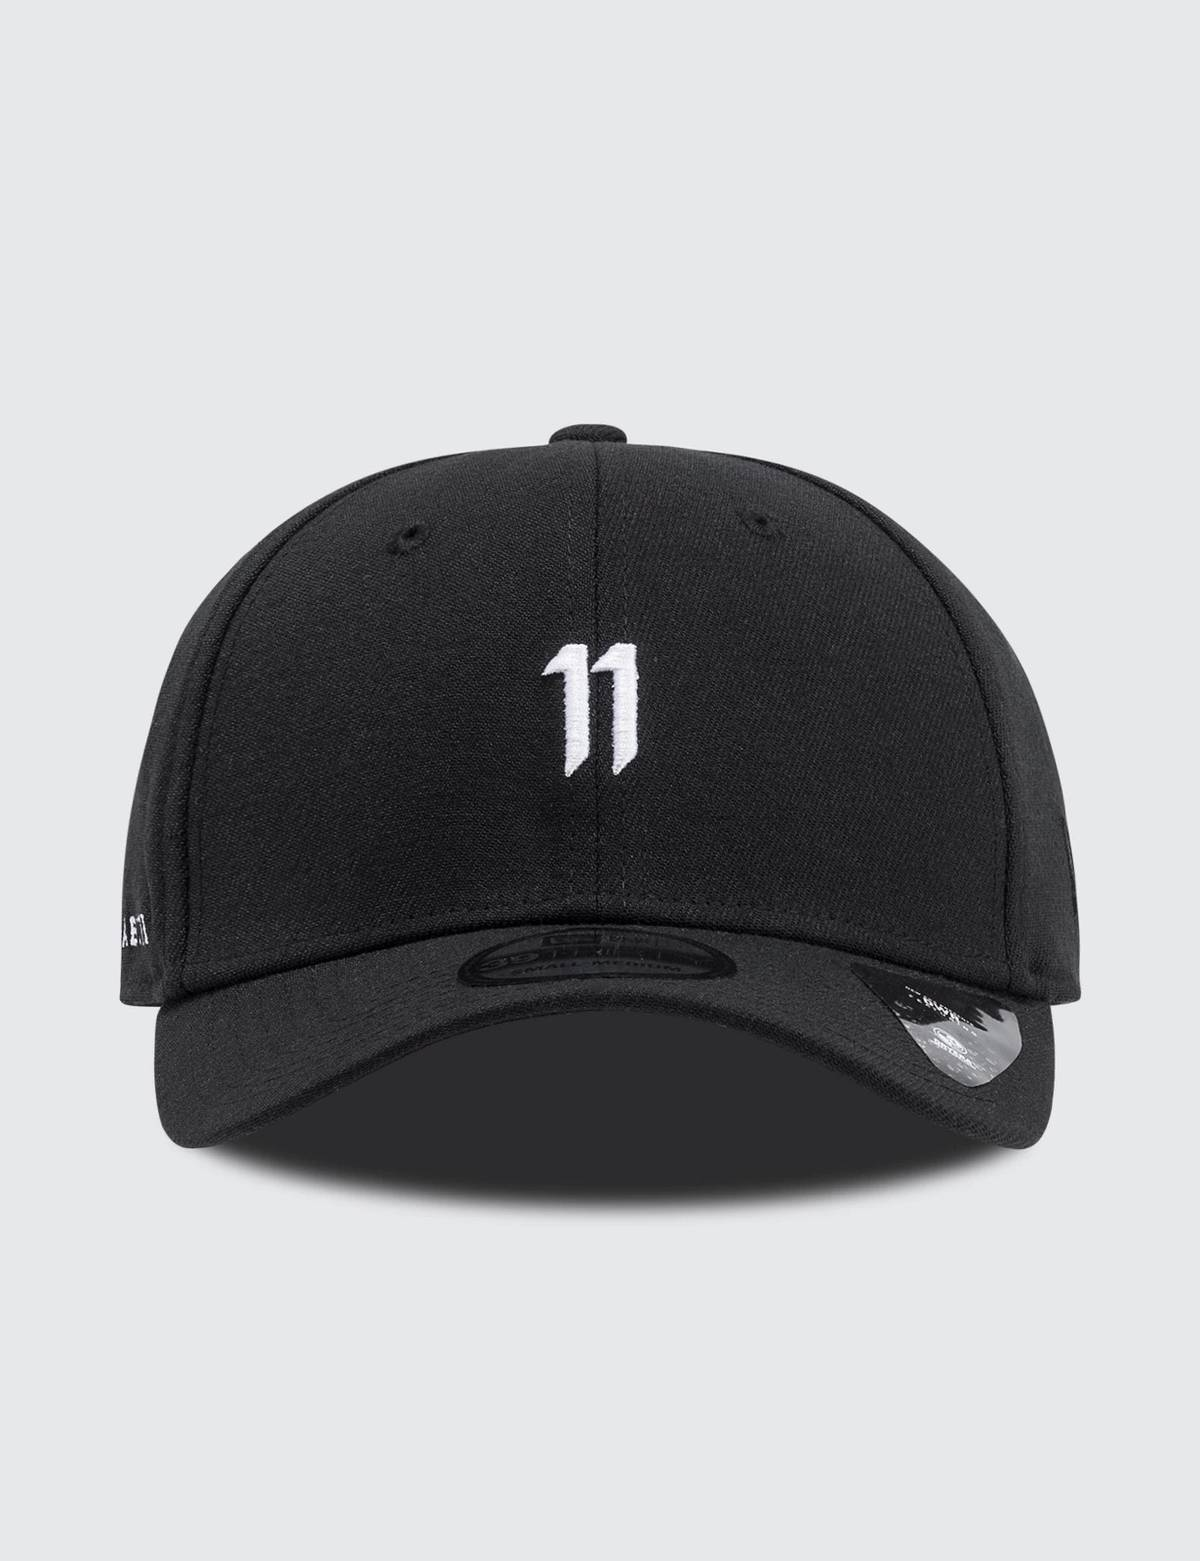 8c055326aa2 11 By Boris Bidjan Saberi 11 BY BORIS BIDJAN SABERI New Era 39thirty  Collaboration Cap Size one size - Hats for Sale - Grailed